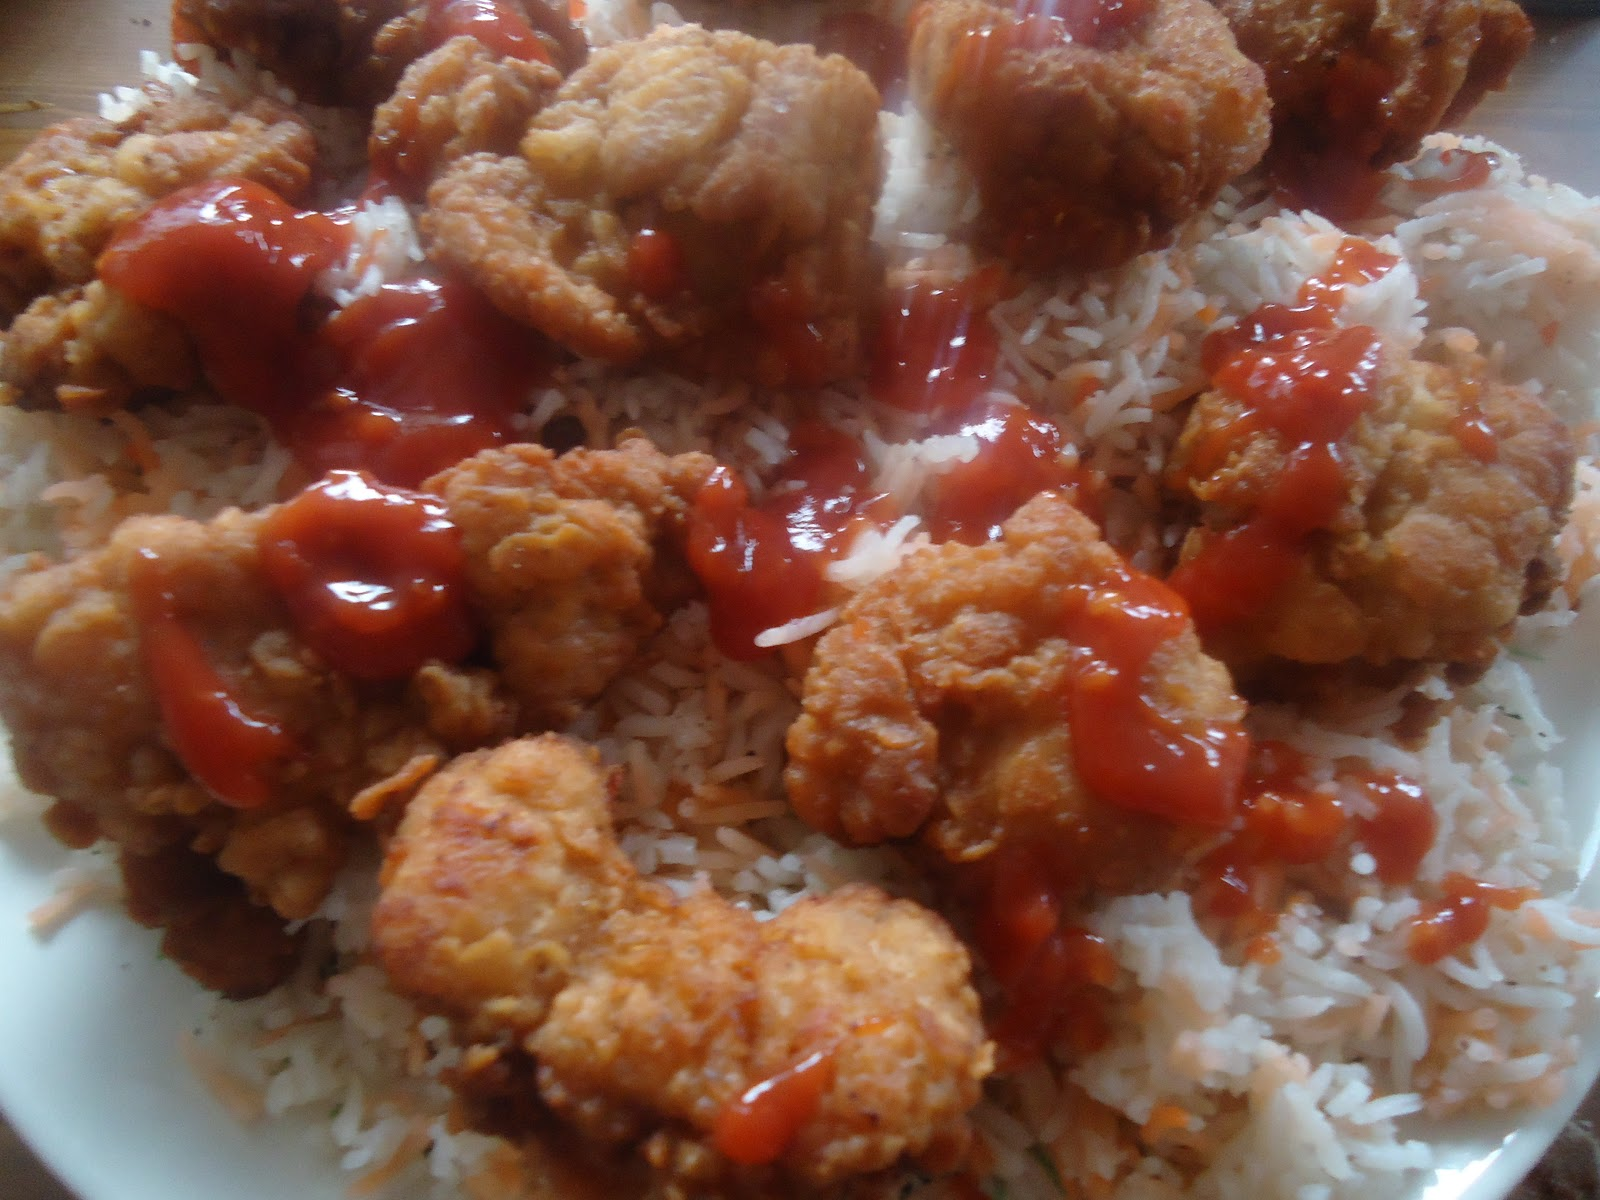 KFC Style Hot Shots With Arabian Rice